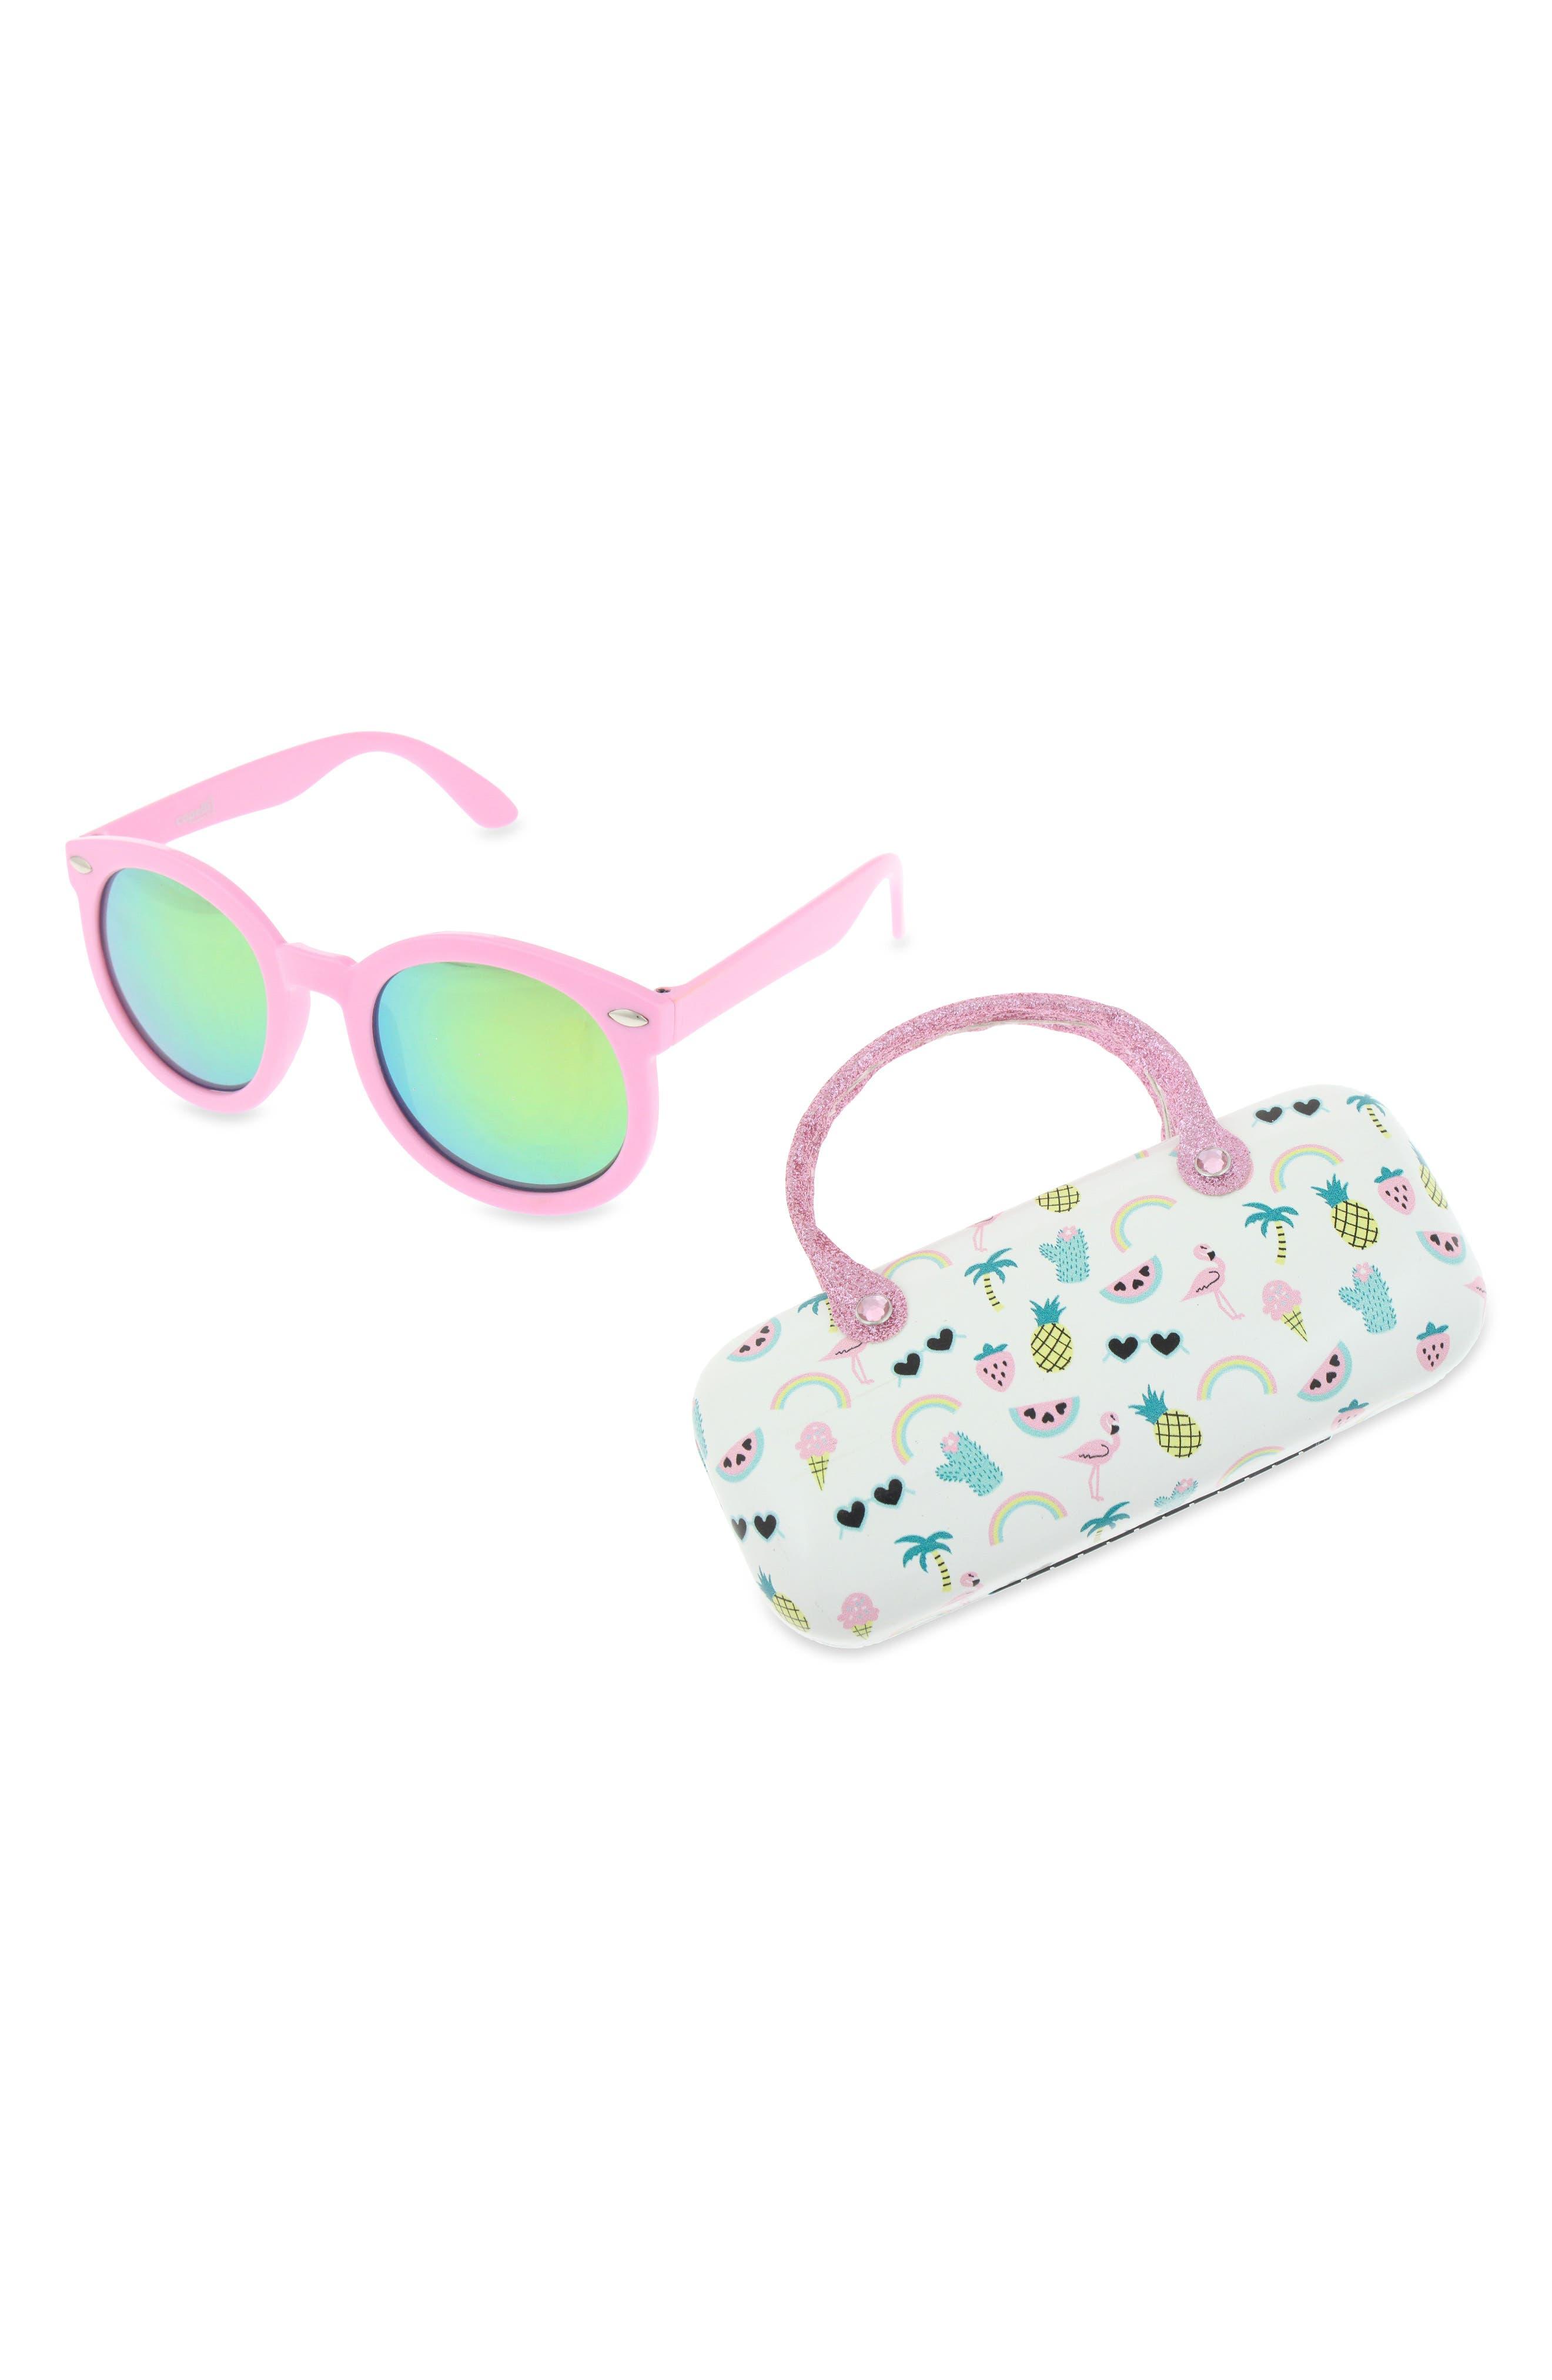 Summer Fun 60mm Sunglasses & Case Set,                             Main thumbnail 1, color,